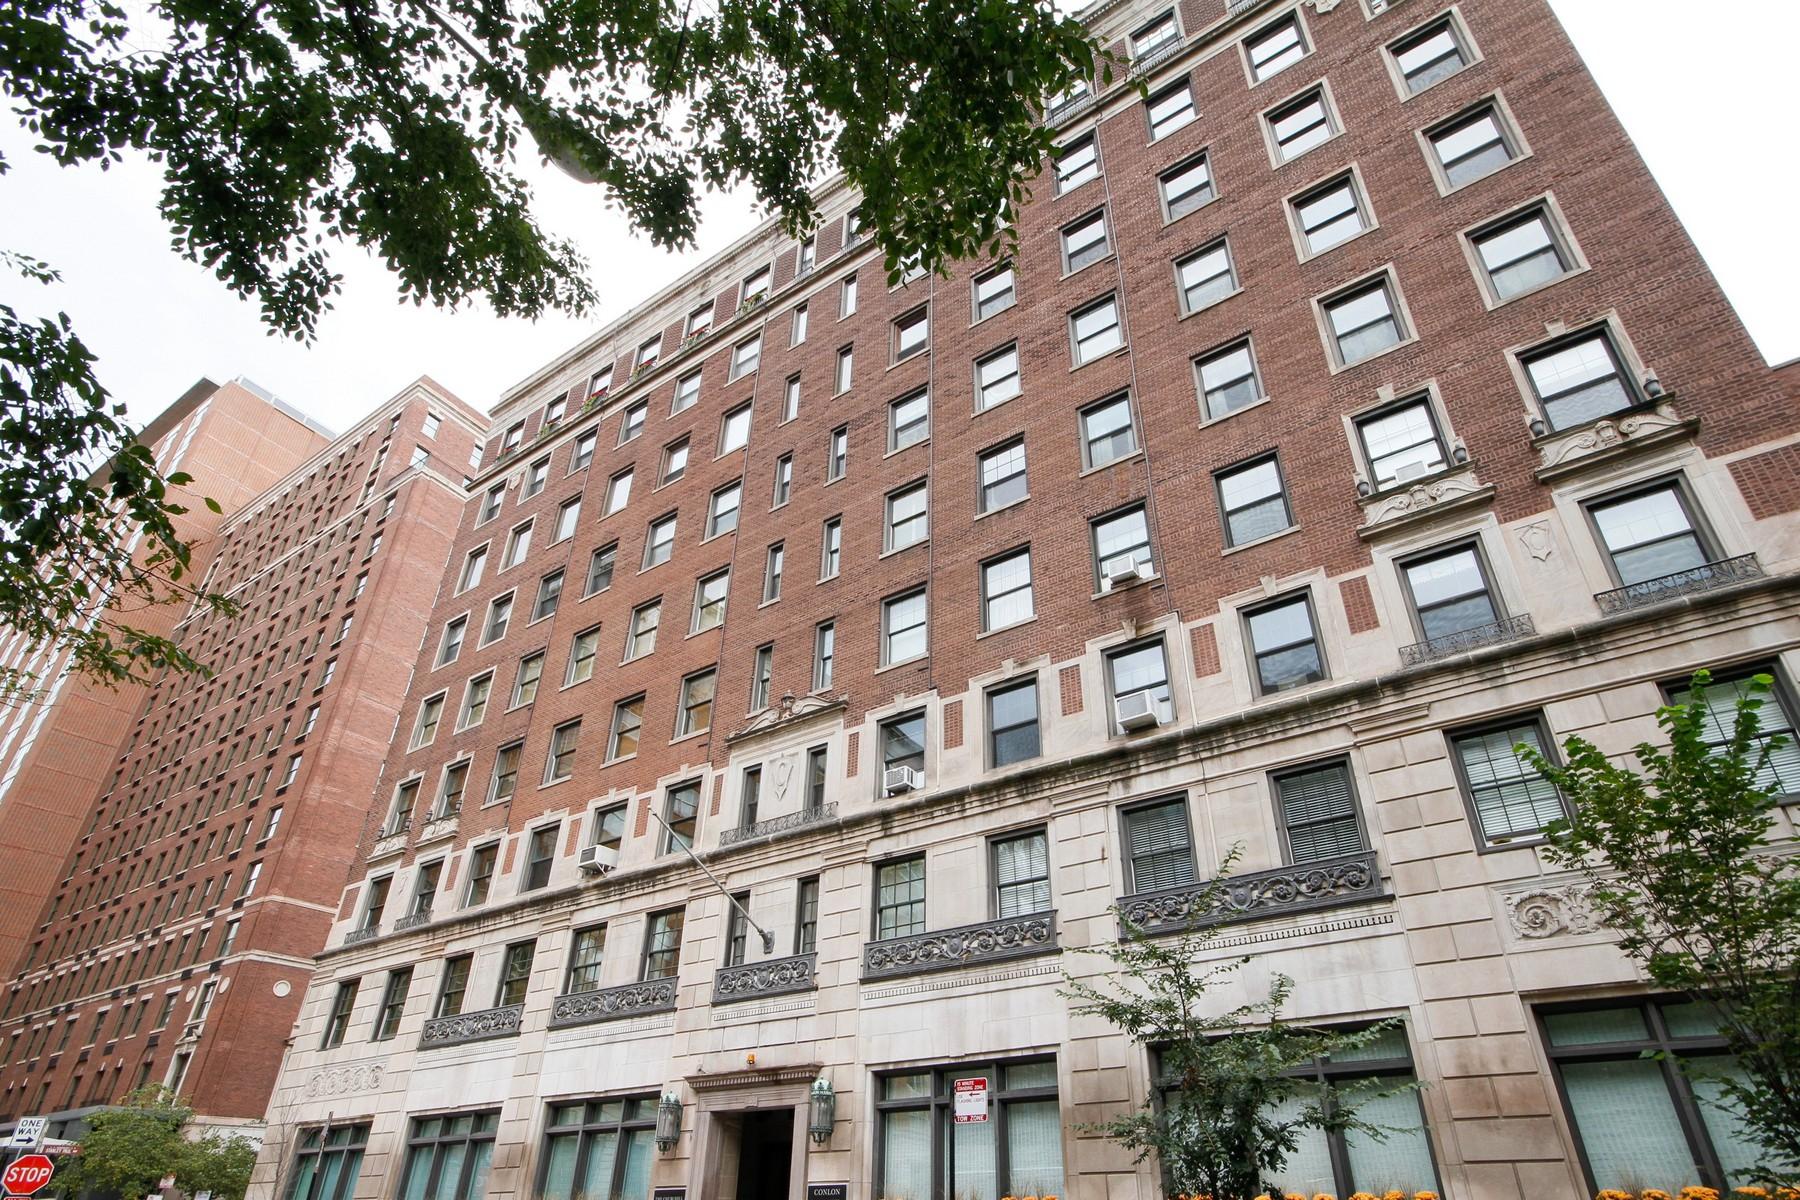 Casa para uma família para Venda às Wonderful Gold Coast Penthouse 1255 N State Parkway Unit 9D Chicago, Illinois, 60610 Estados Unidos